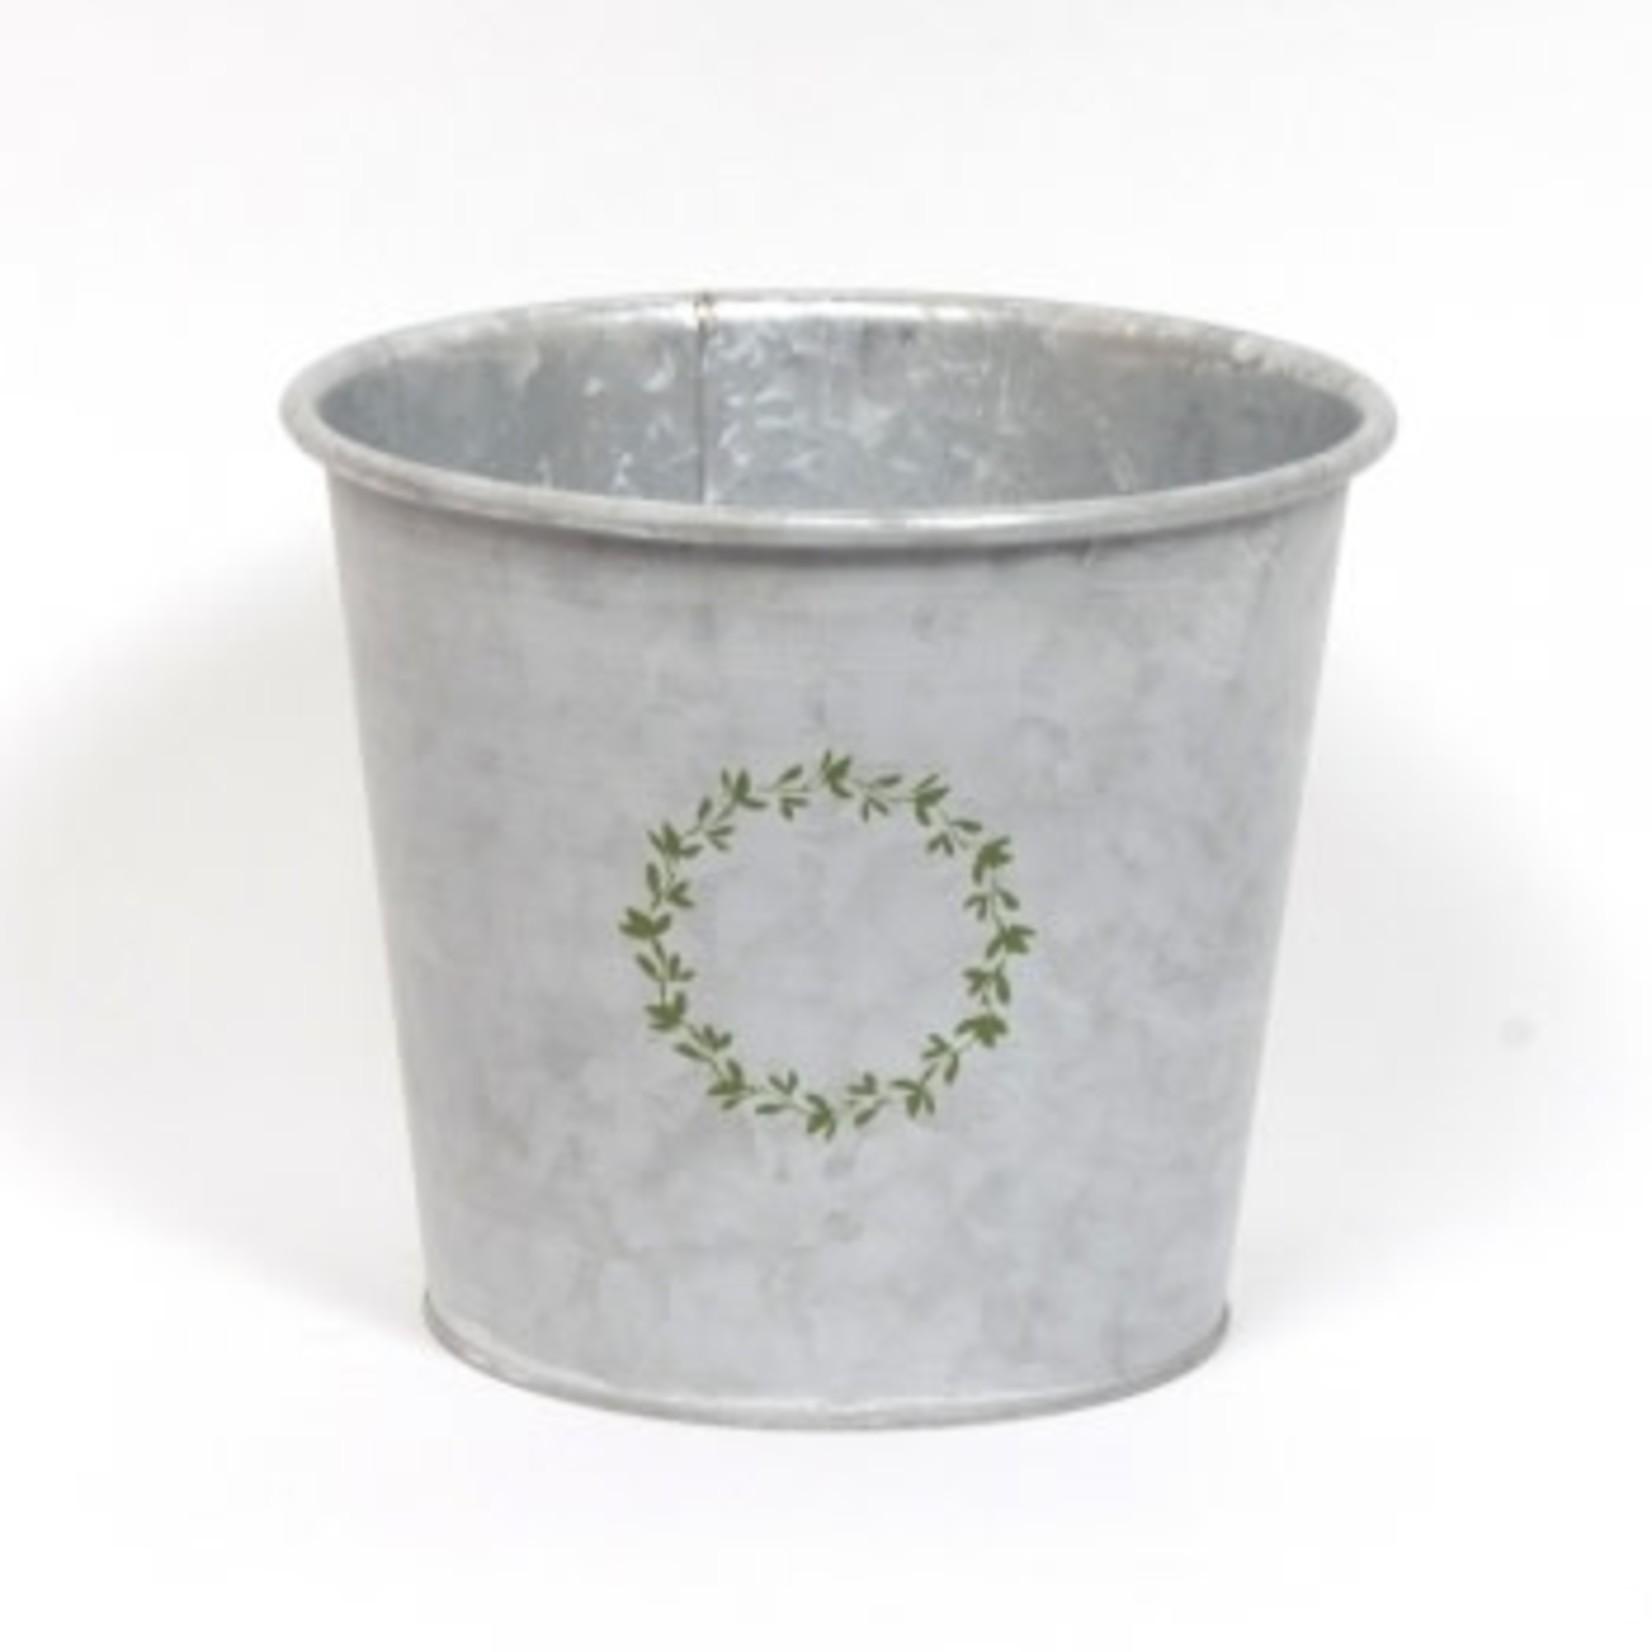 Whitewash Galvanized Wreath Pot - Medium